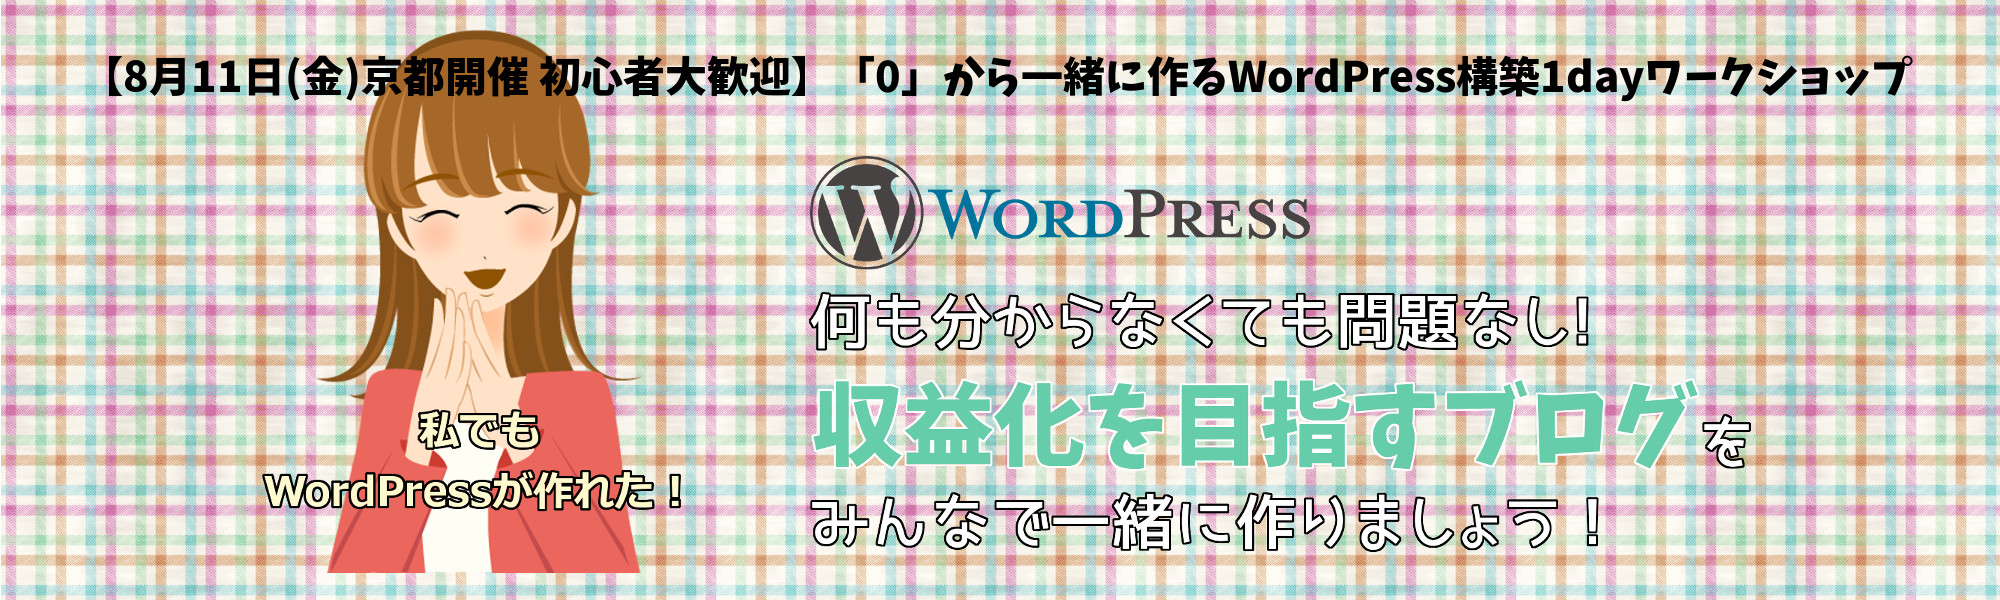 WordPress構築 ワークショップ 初心者 ブログ セミナー